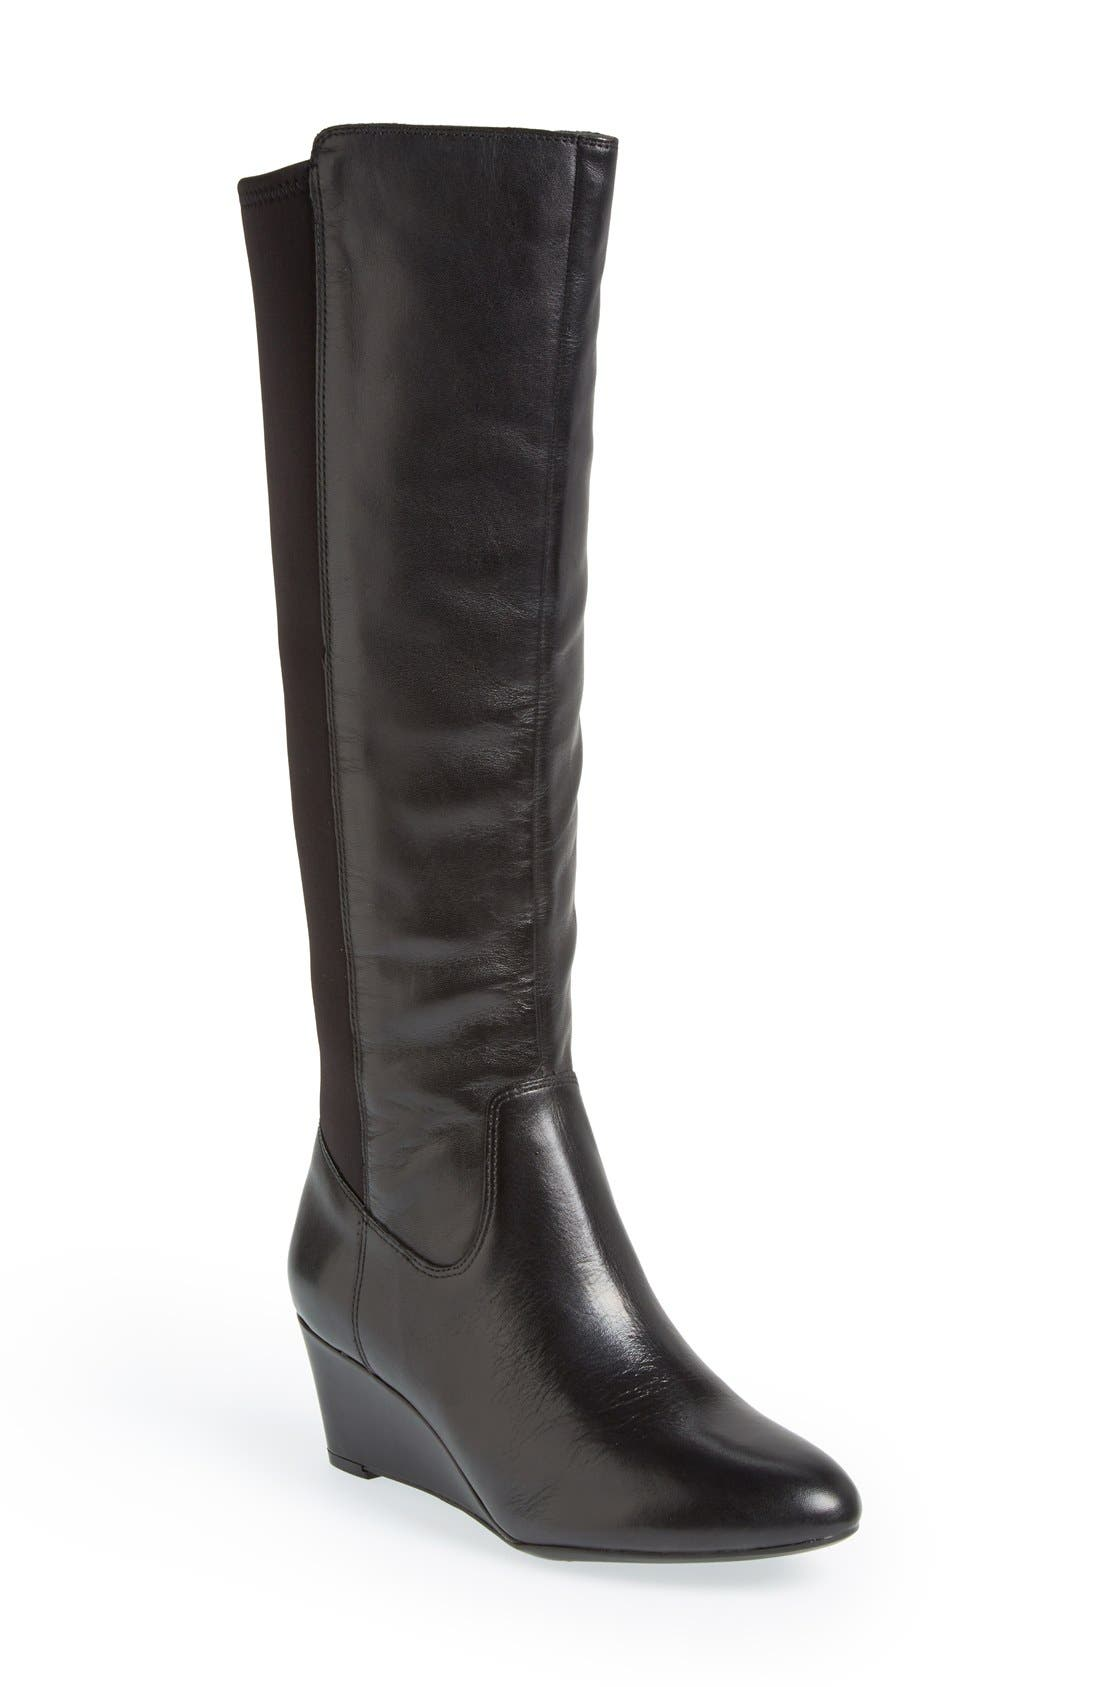 Main Image - Naturalizer 'Quinlee' Knee High Boot (Women)